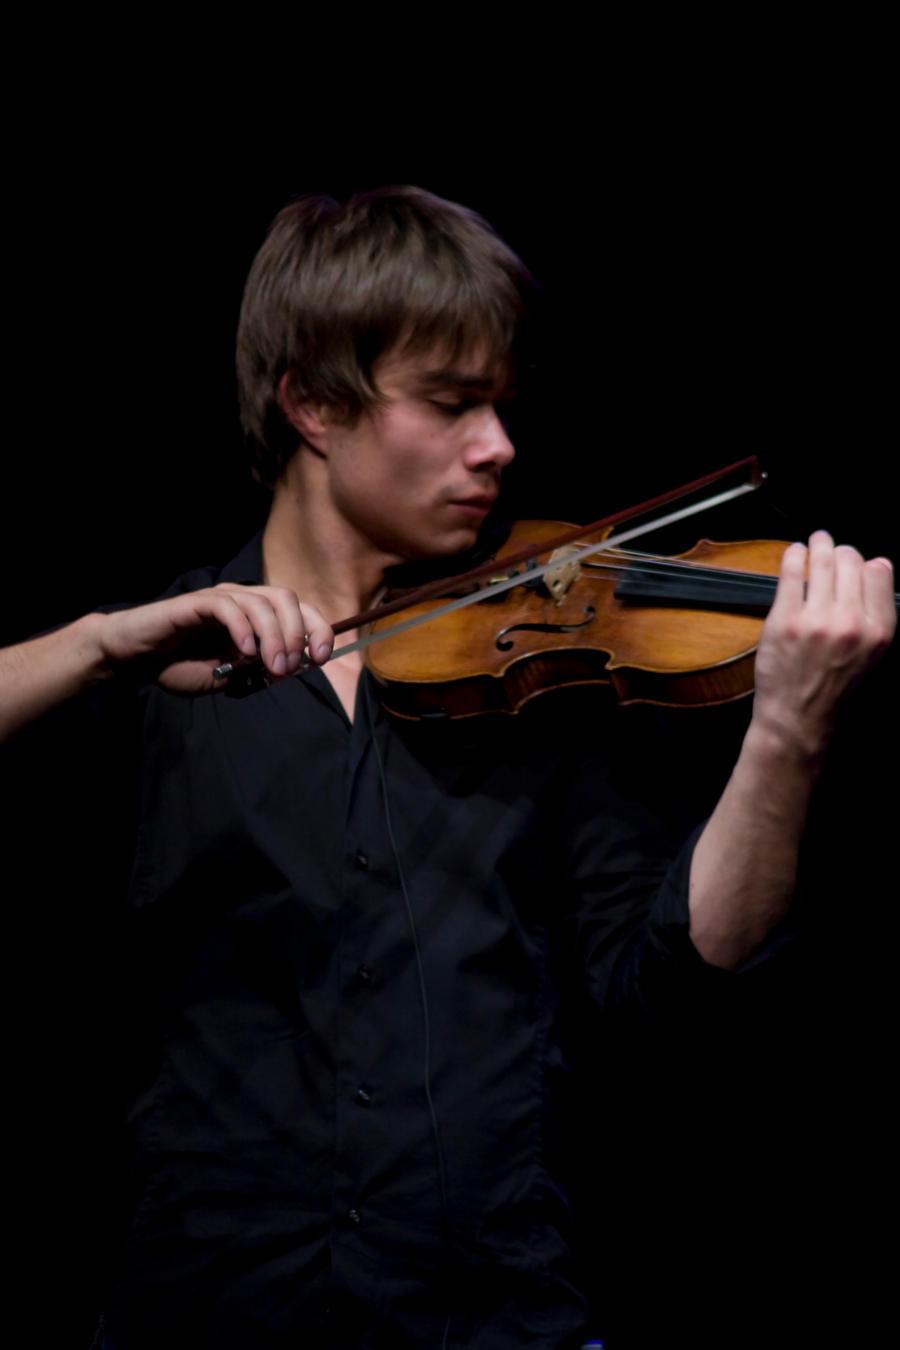 Alexander Rybak Concert 3 by karlfk